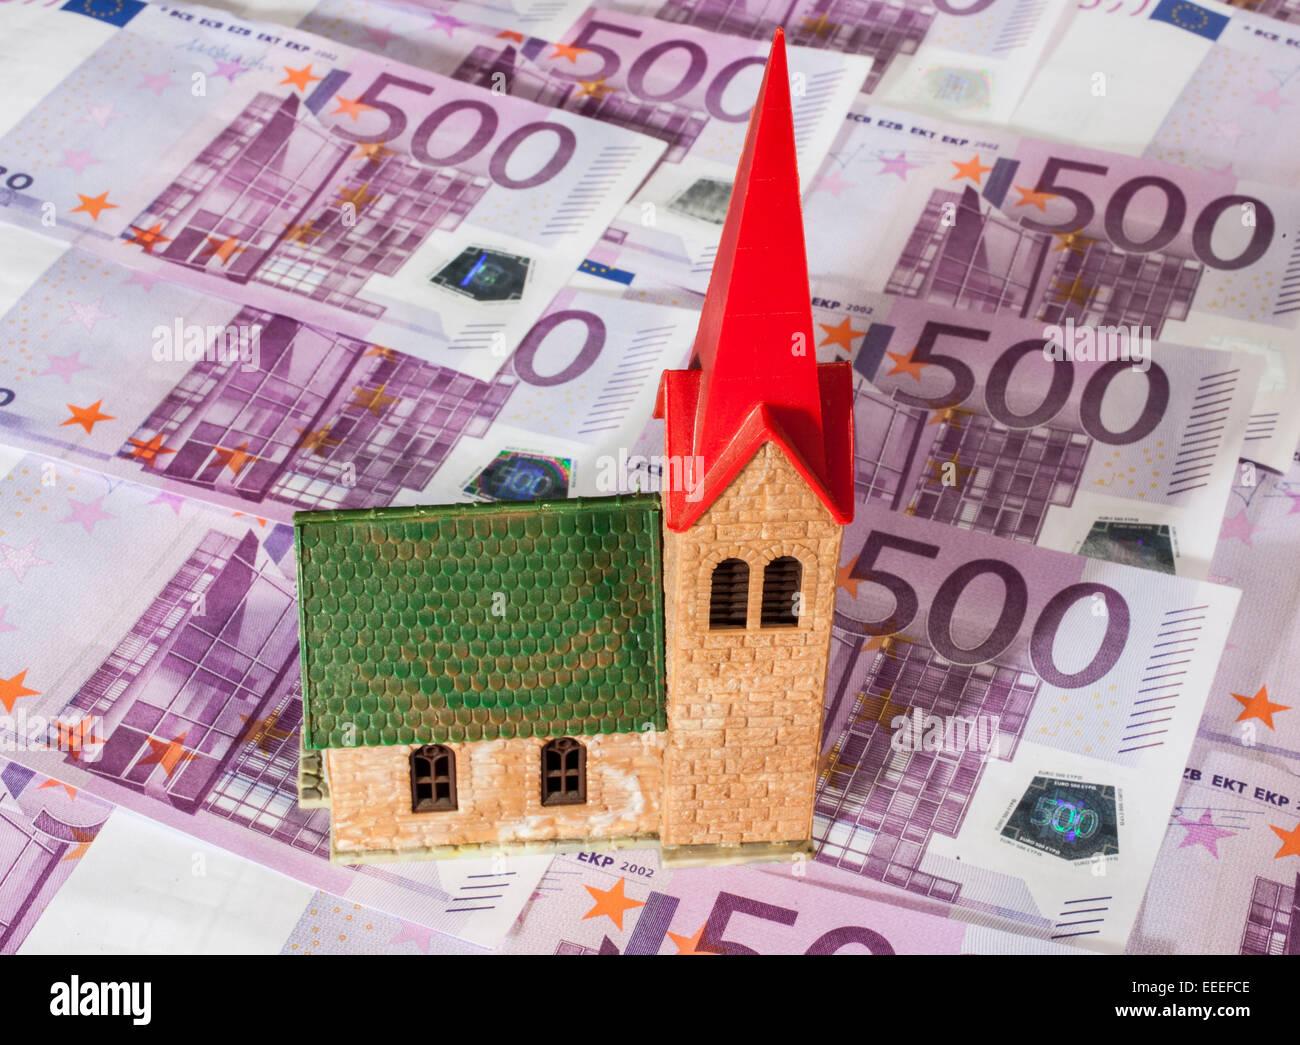 Church with 500 Euro banknotes, 08.January 2015 Stock Photo